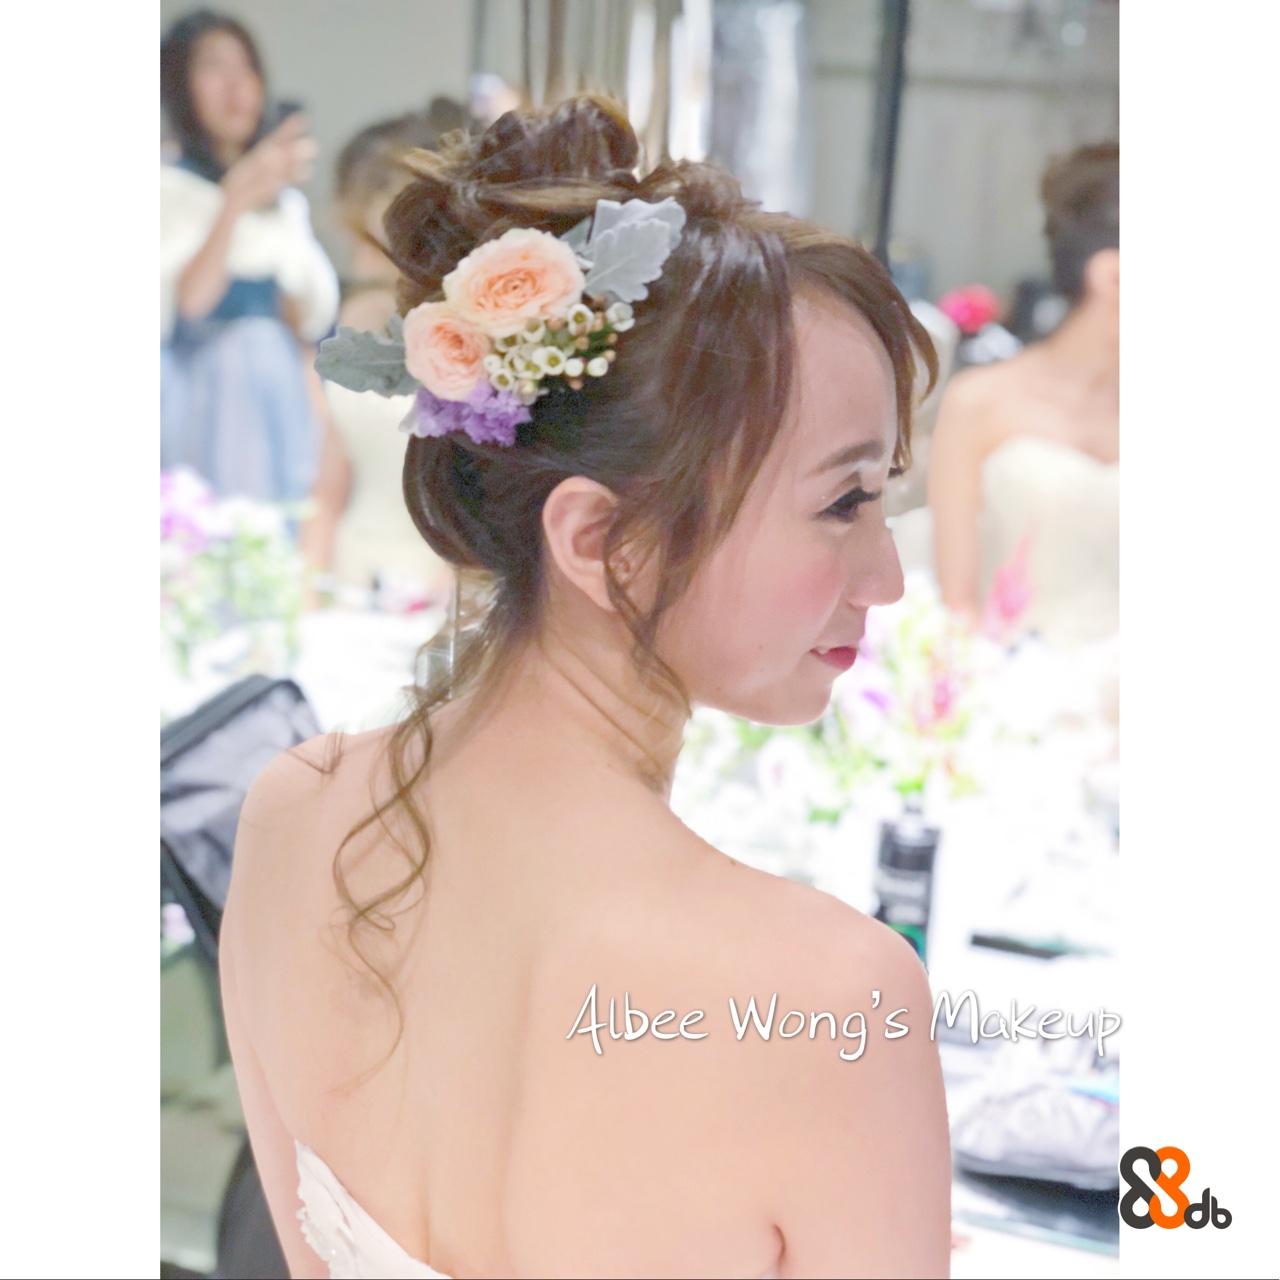 Albee Wong's Makeye  Hair,Headpiece,Hairstyle,Clothing,Hair accessory